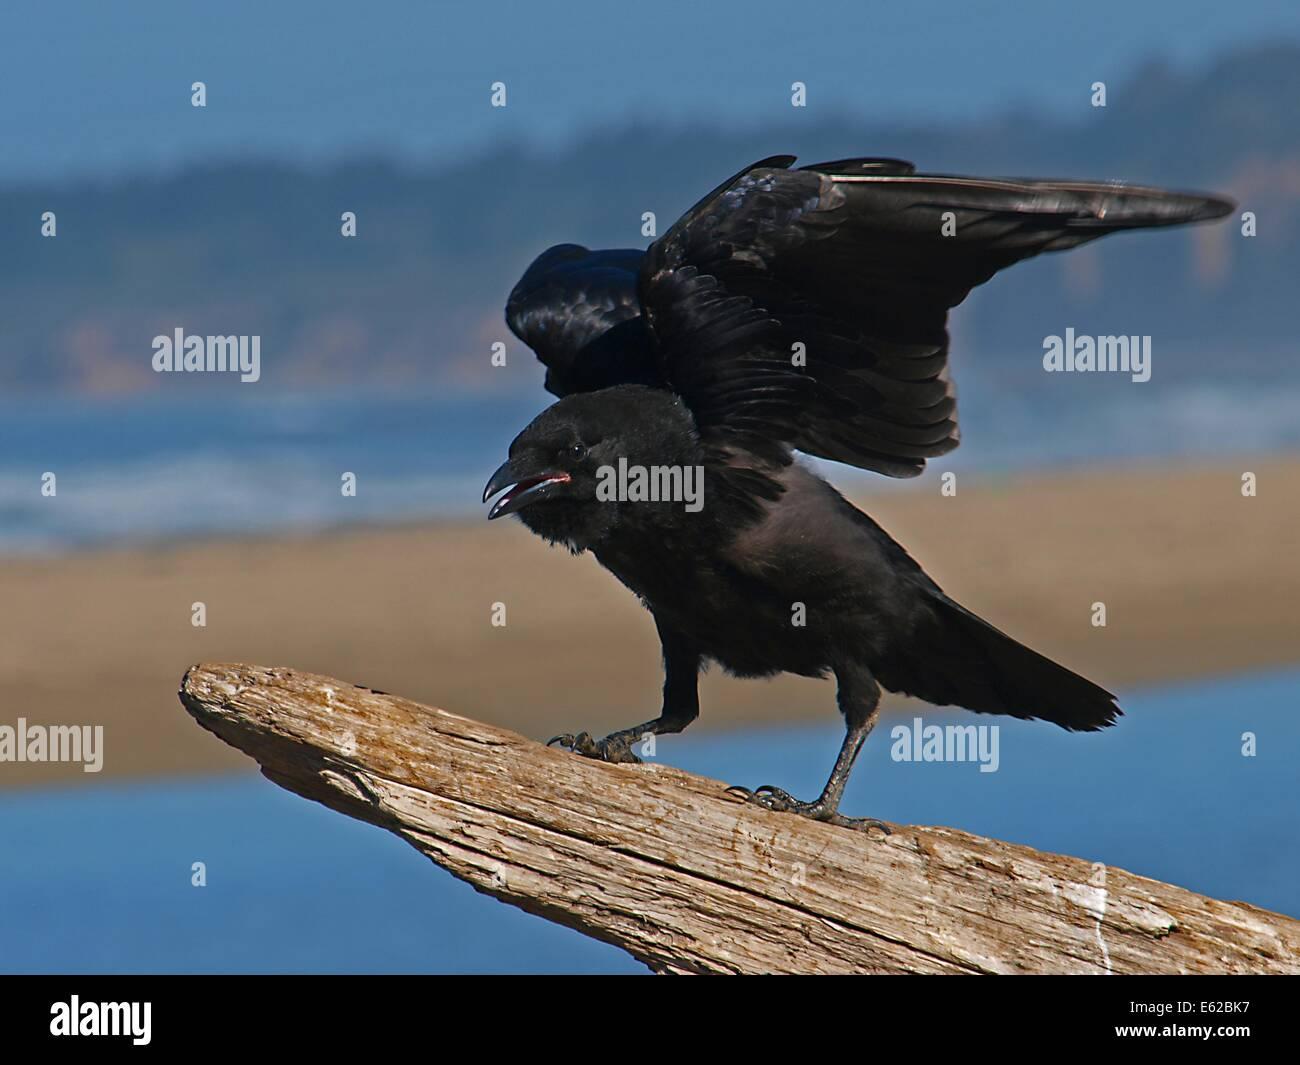 bird crow black animal raven nature wildlife - Stock Image